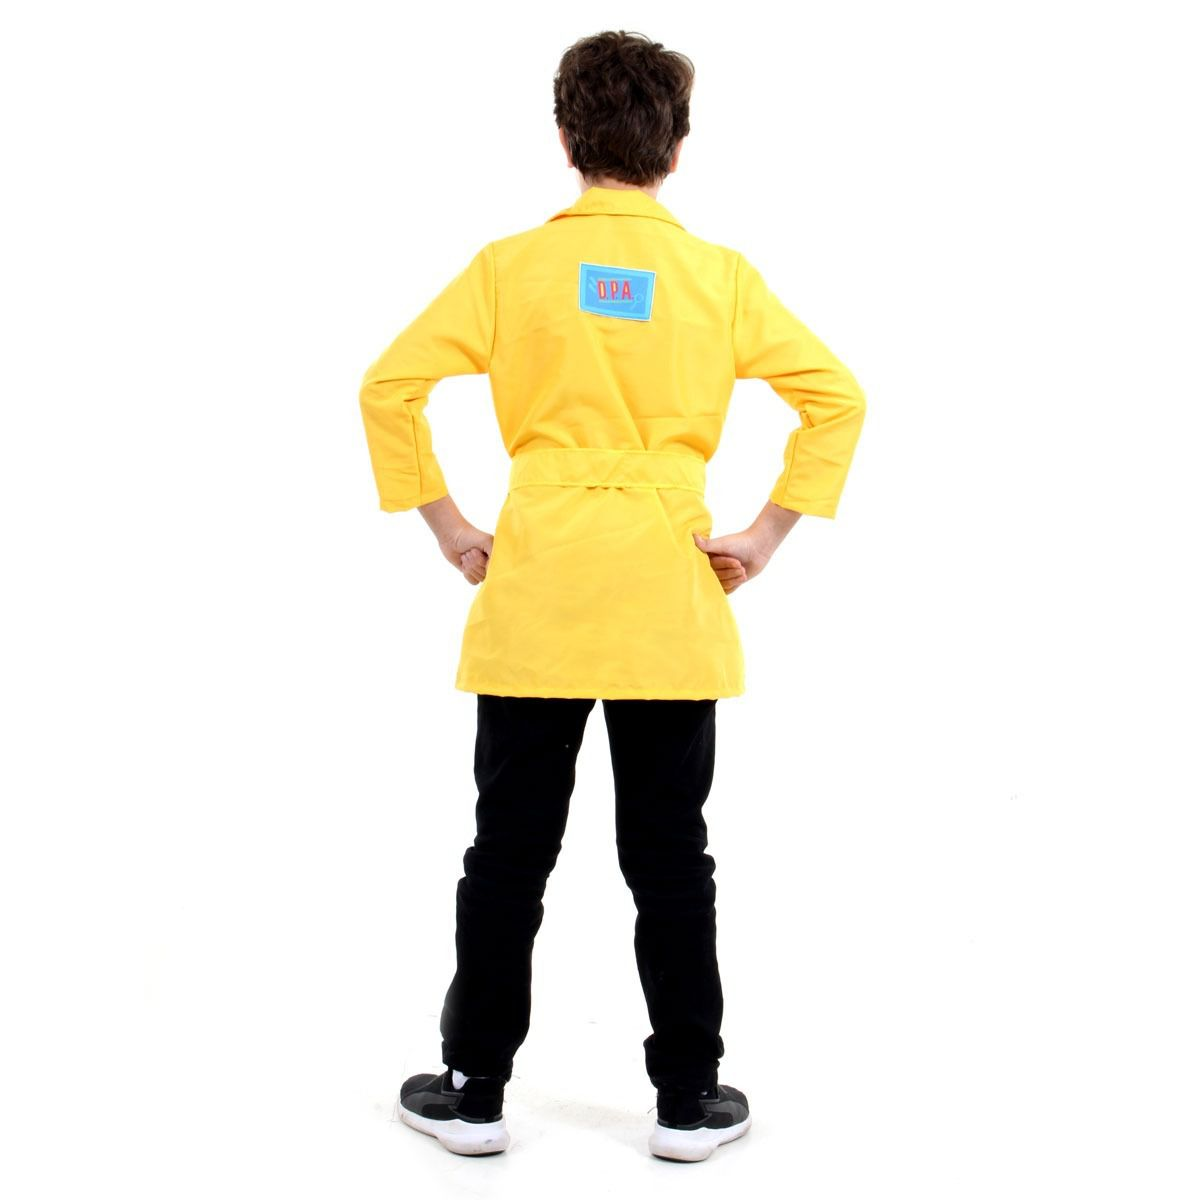 Fantasia Capa Dpa 2 Amarelo Bento Detetives Prédio Azul 2